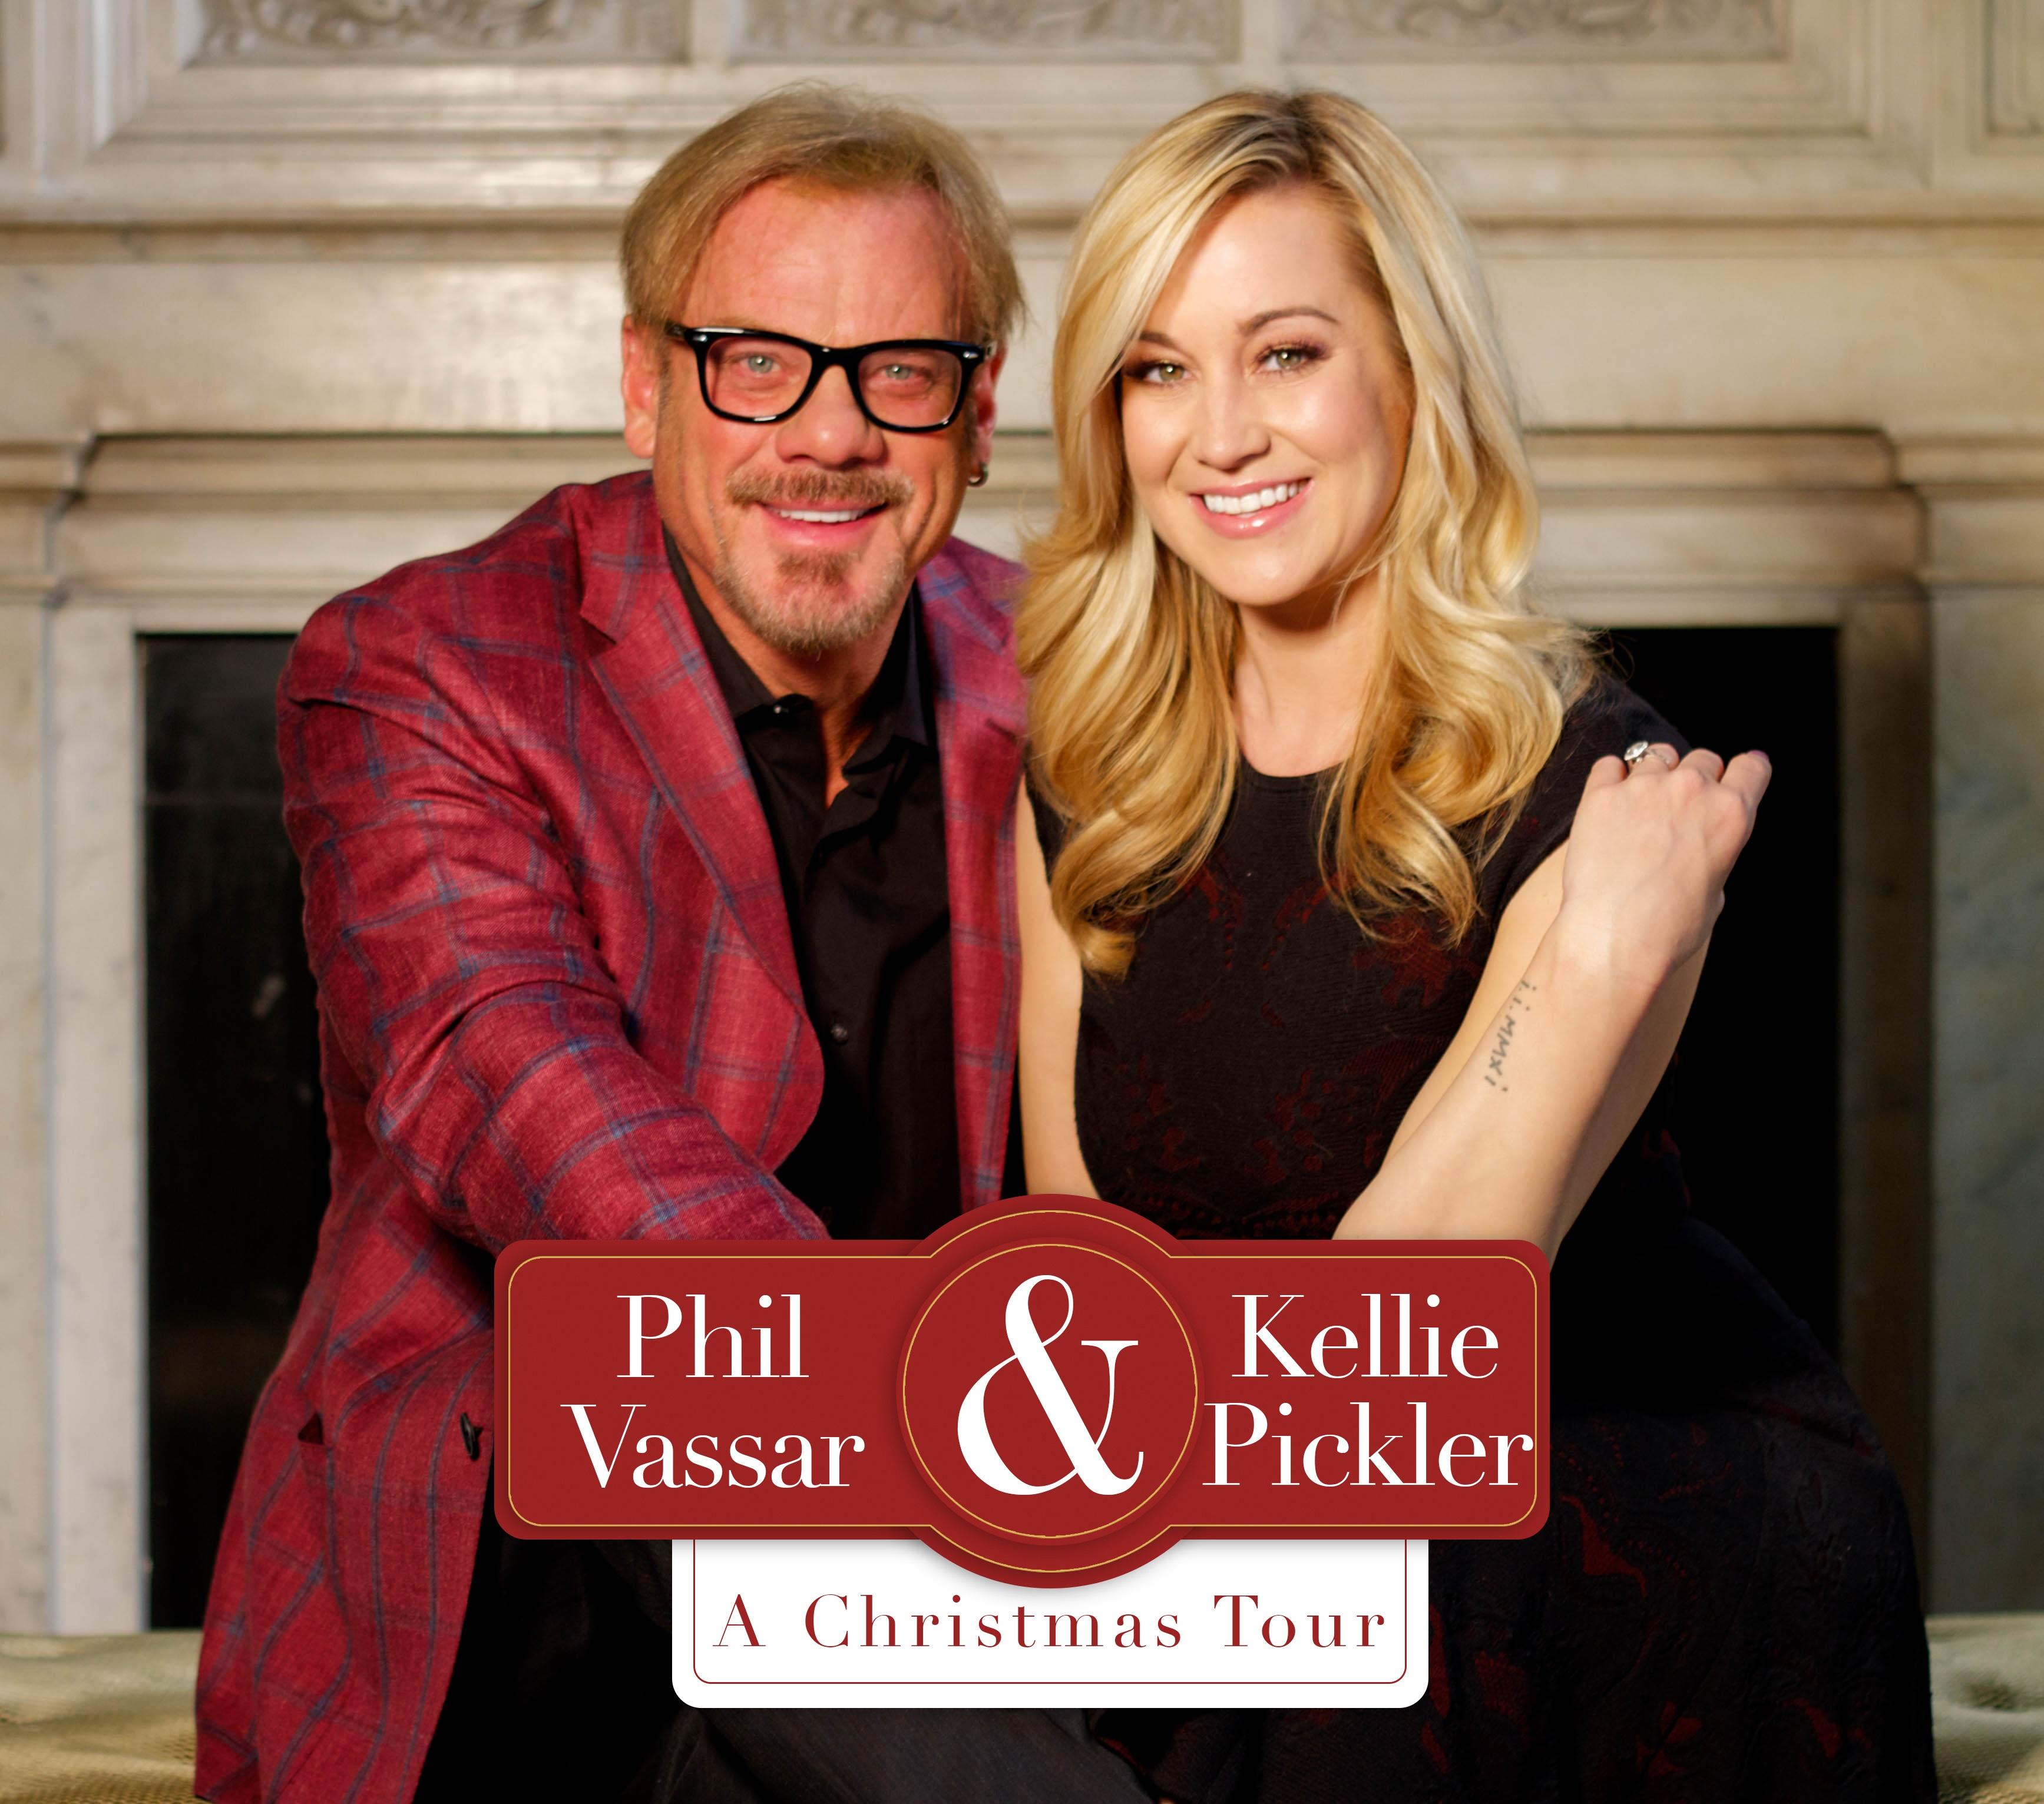 Phil Vassar and Kellie Pickler Unite for Christmas Single and Tour ...